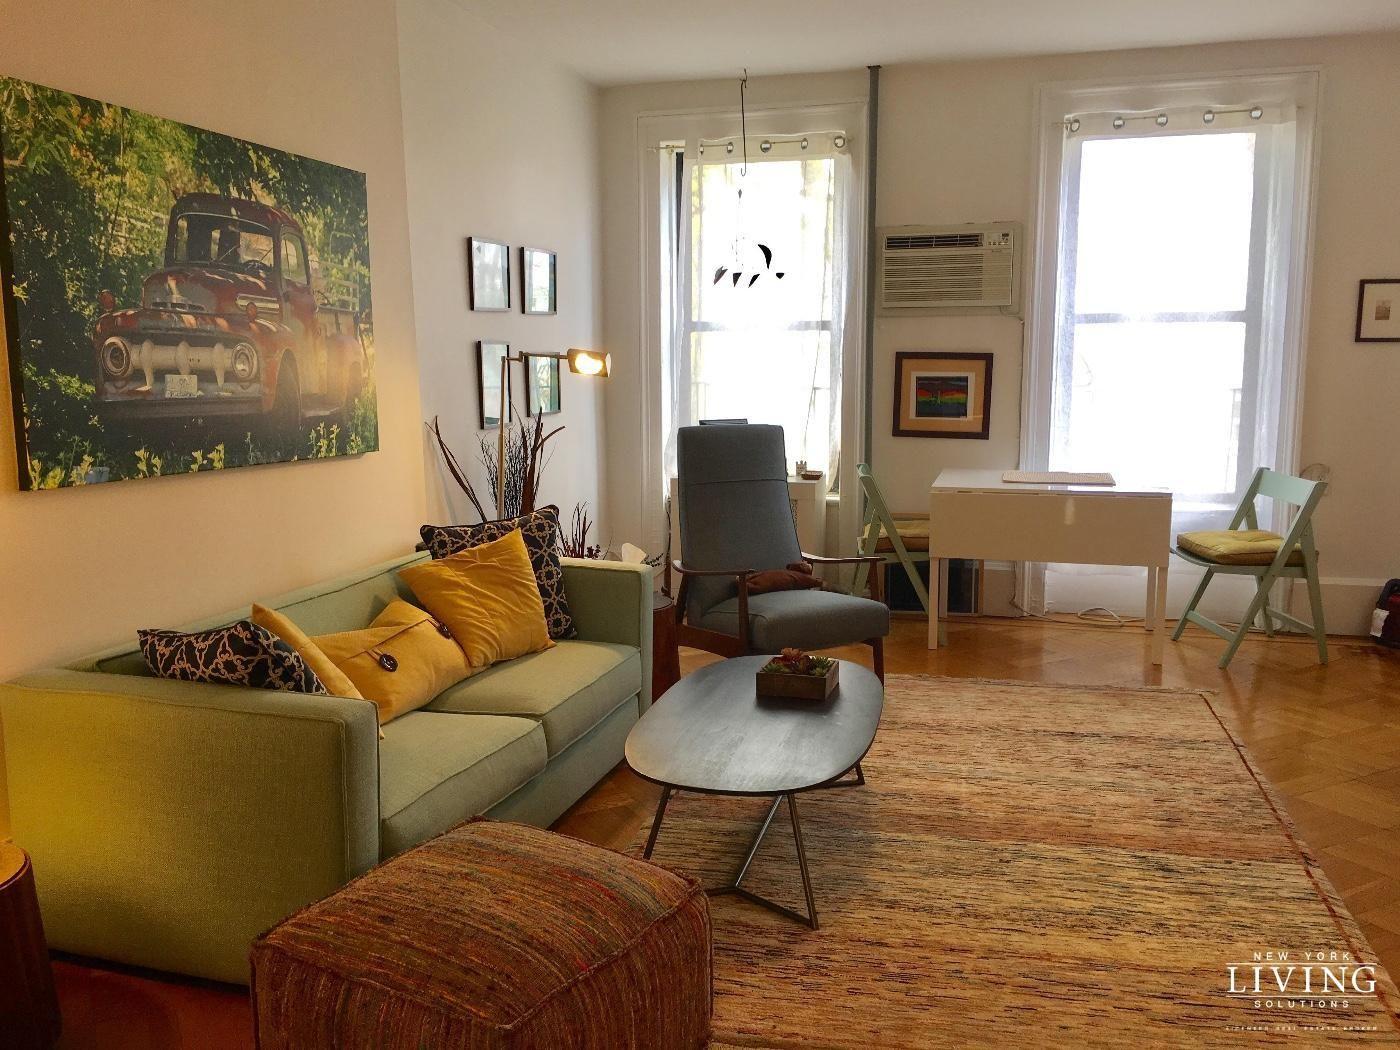 1 Bedroom Apartment For Rent Brooklyn